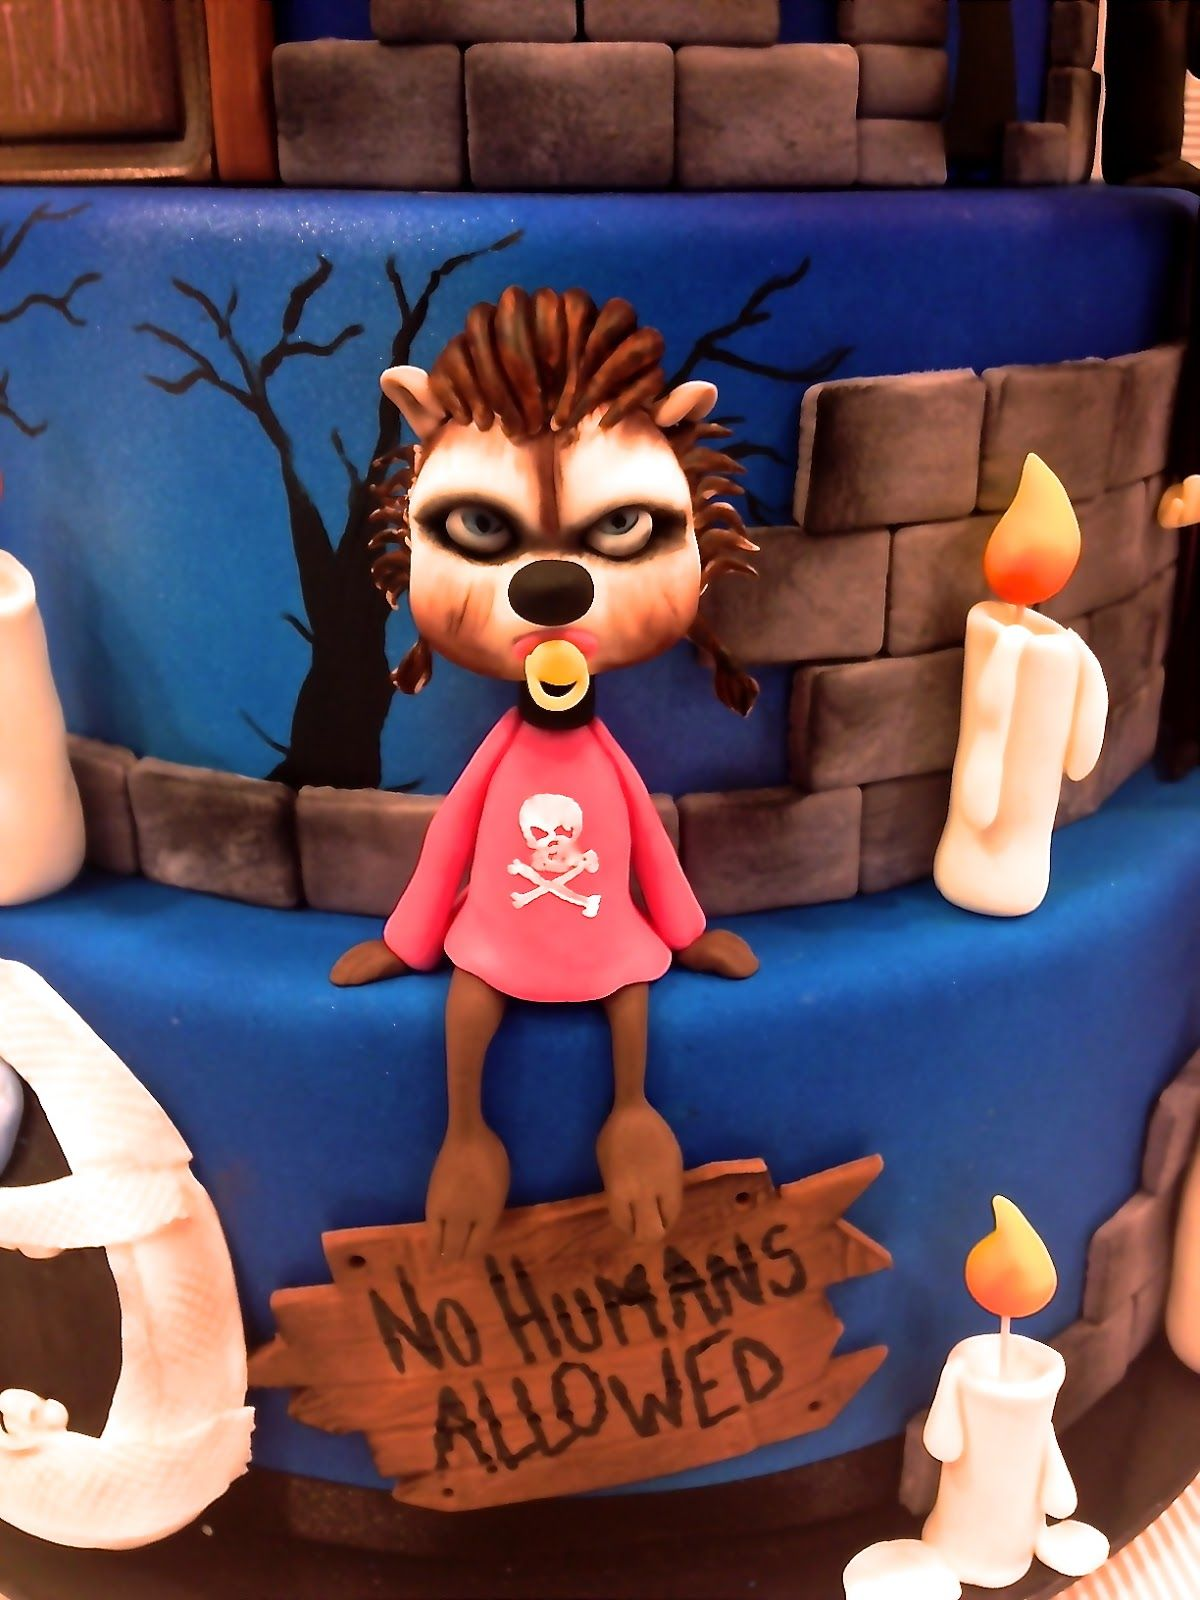 Hotel Transylvania 2 Cakes - Google Halloween